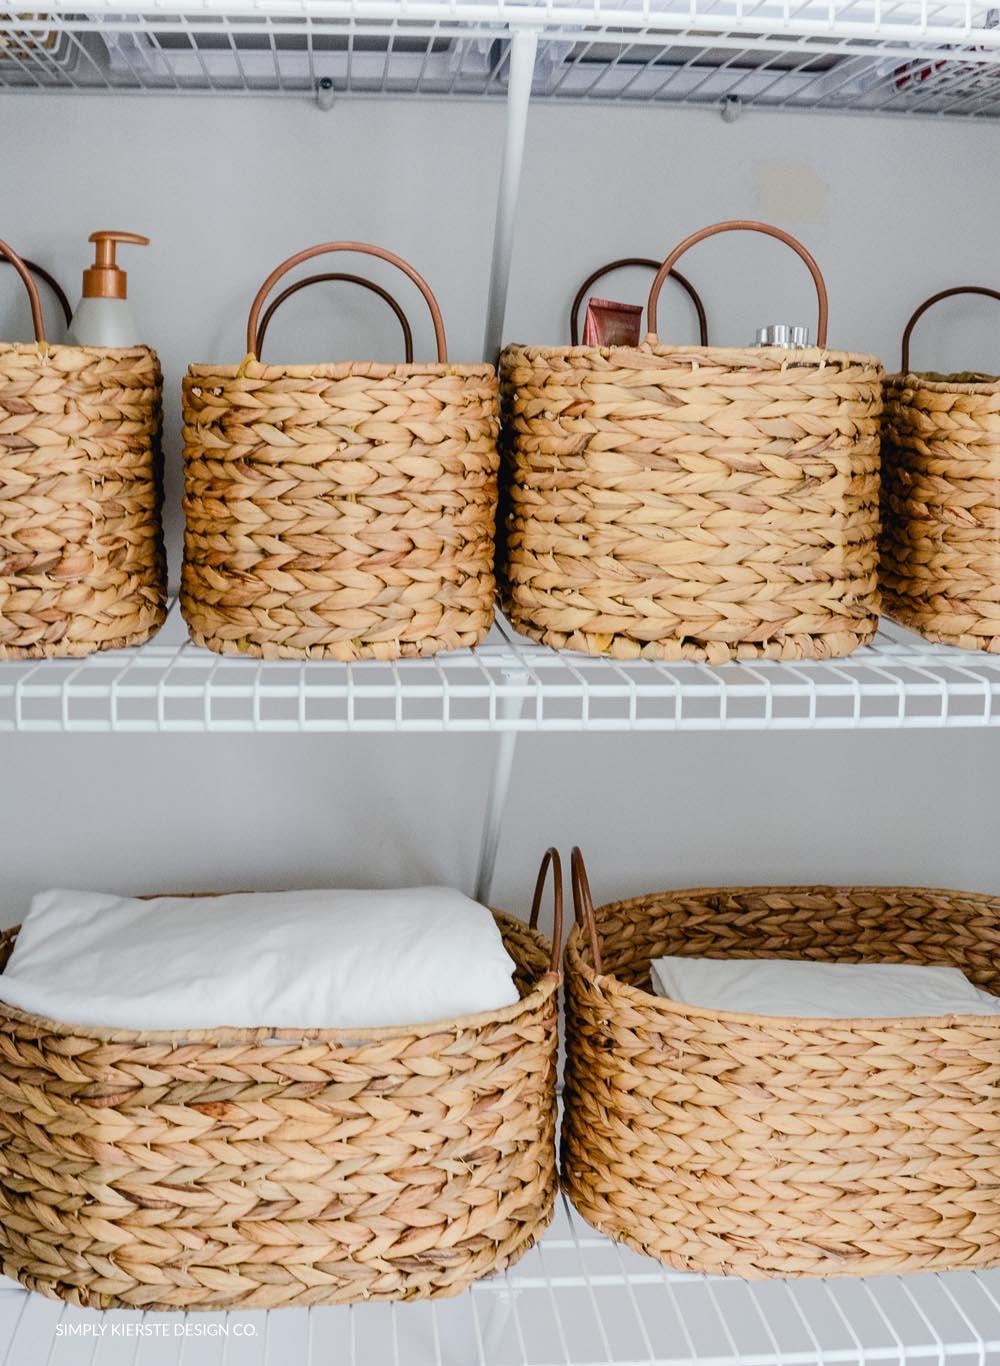 Linen Closet Makeover Organization | How to Organize Your Linen Closet